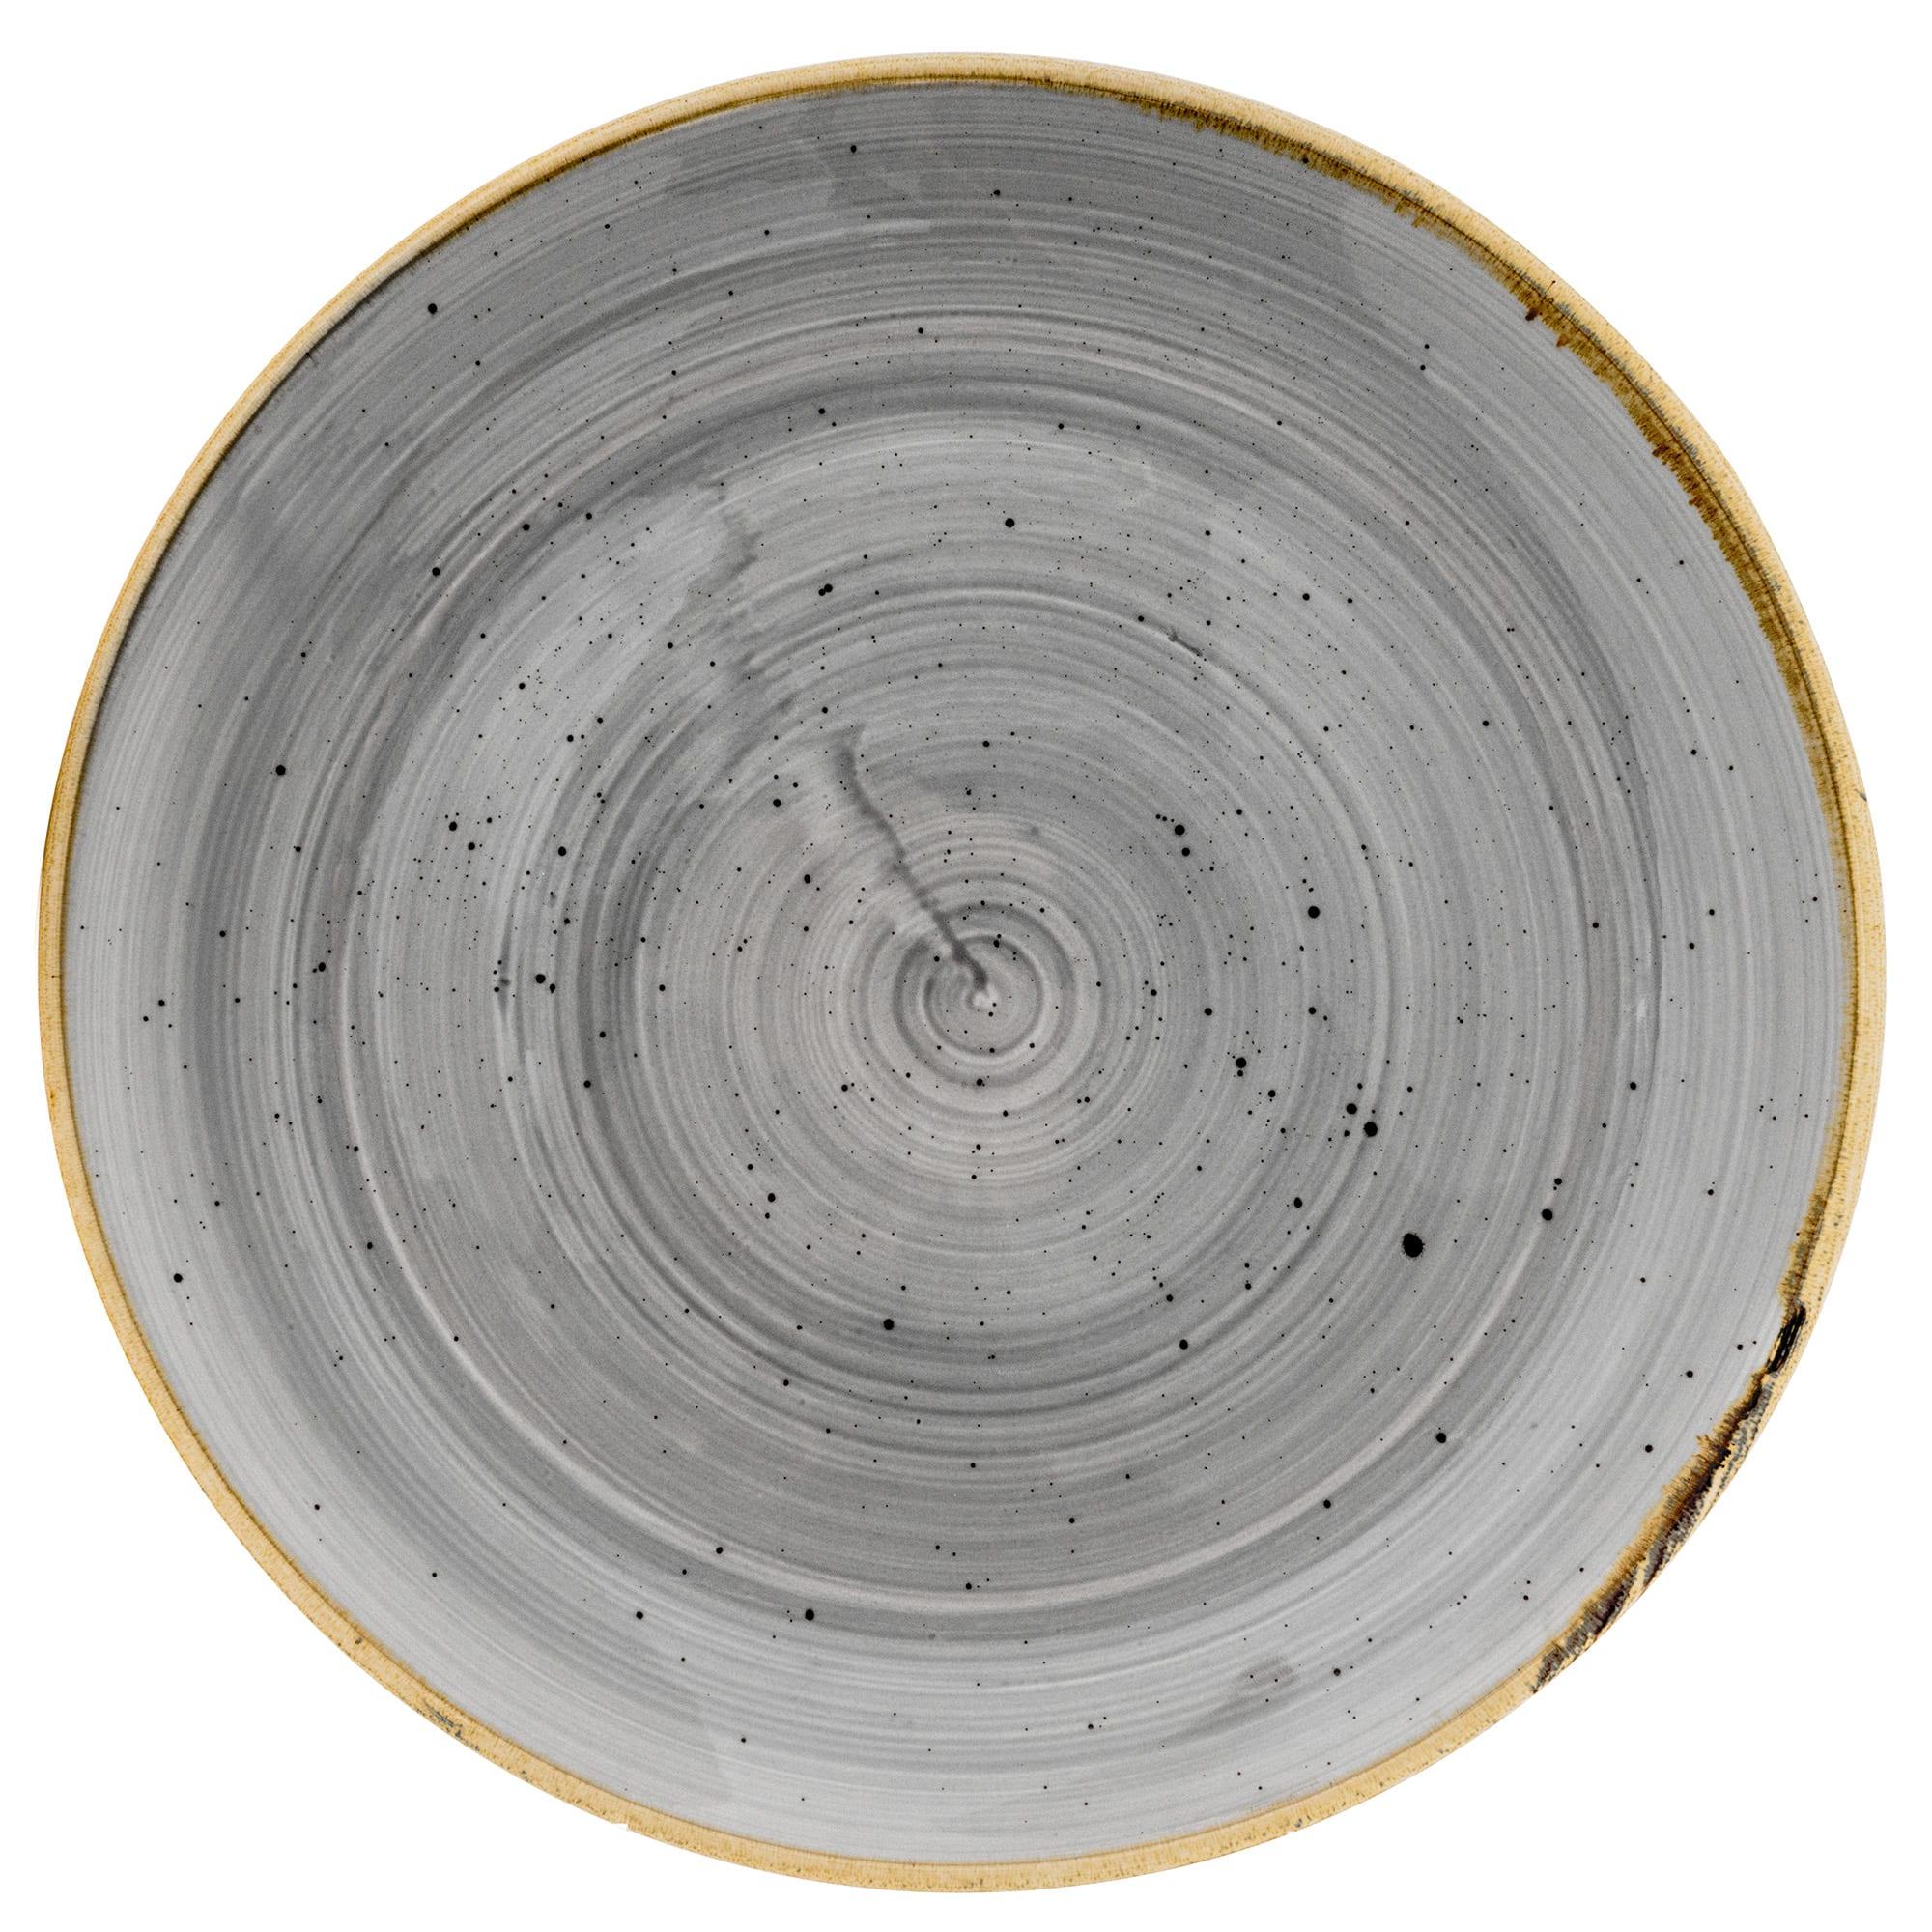 "Churchill SPGSEV101 10.25"" Round Stonecast Plate - Ceramic, Peppercorn Gray"